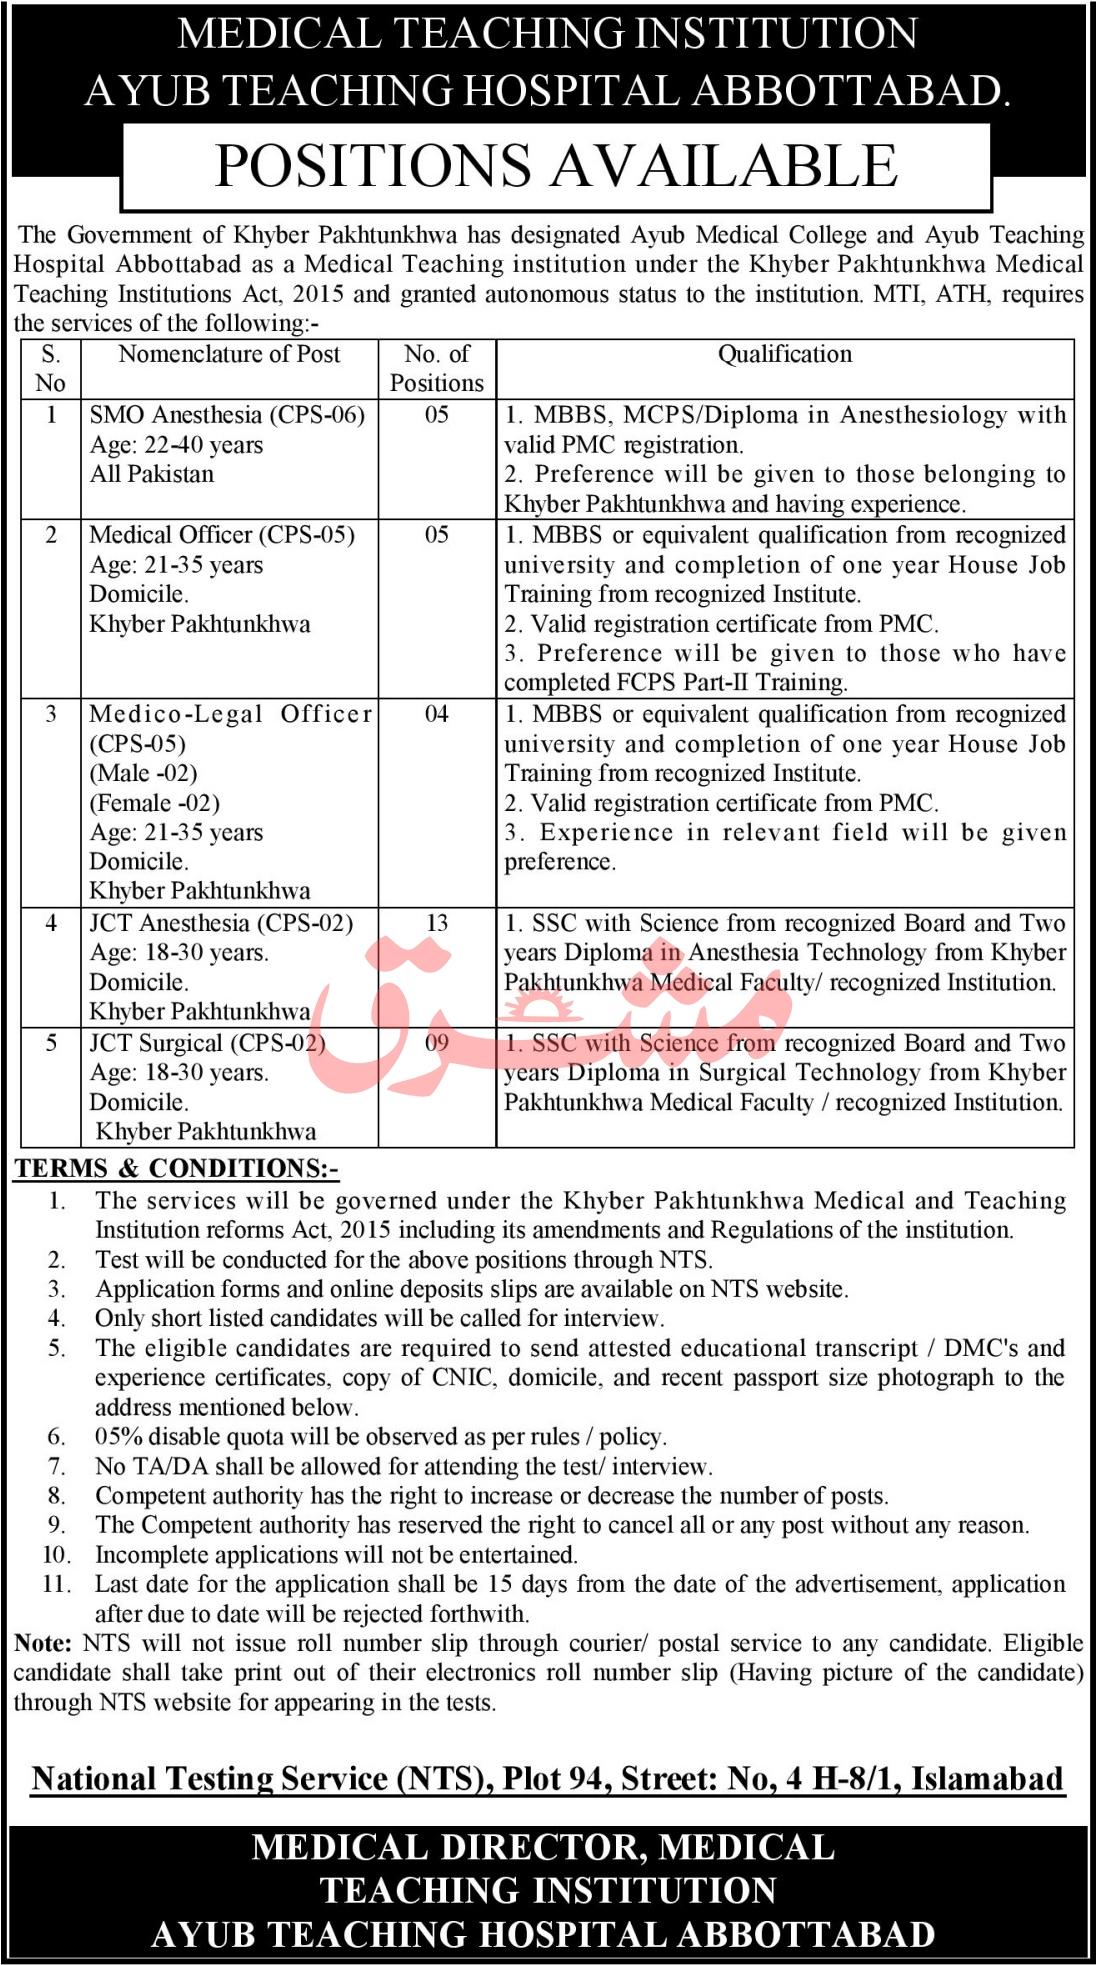 Medical Teaching Institution (MTI) Ayub Teaching Hospital Abbottabad Jobs 2021 in Pakistan